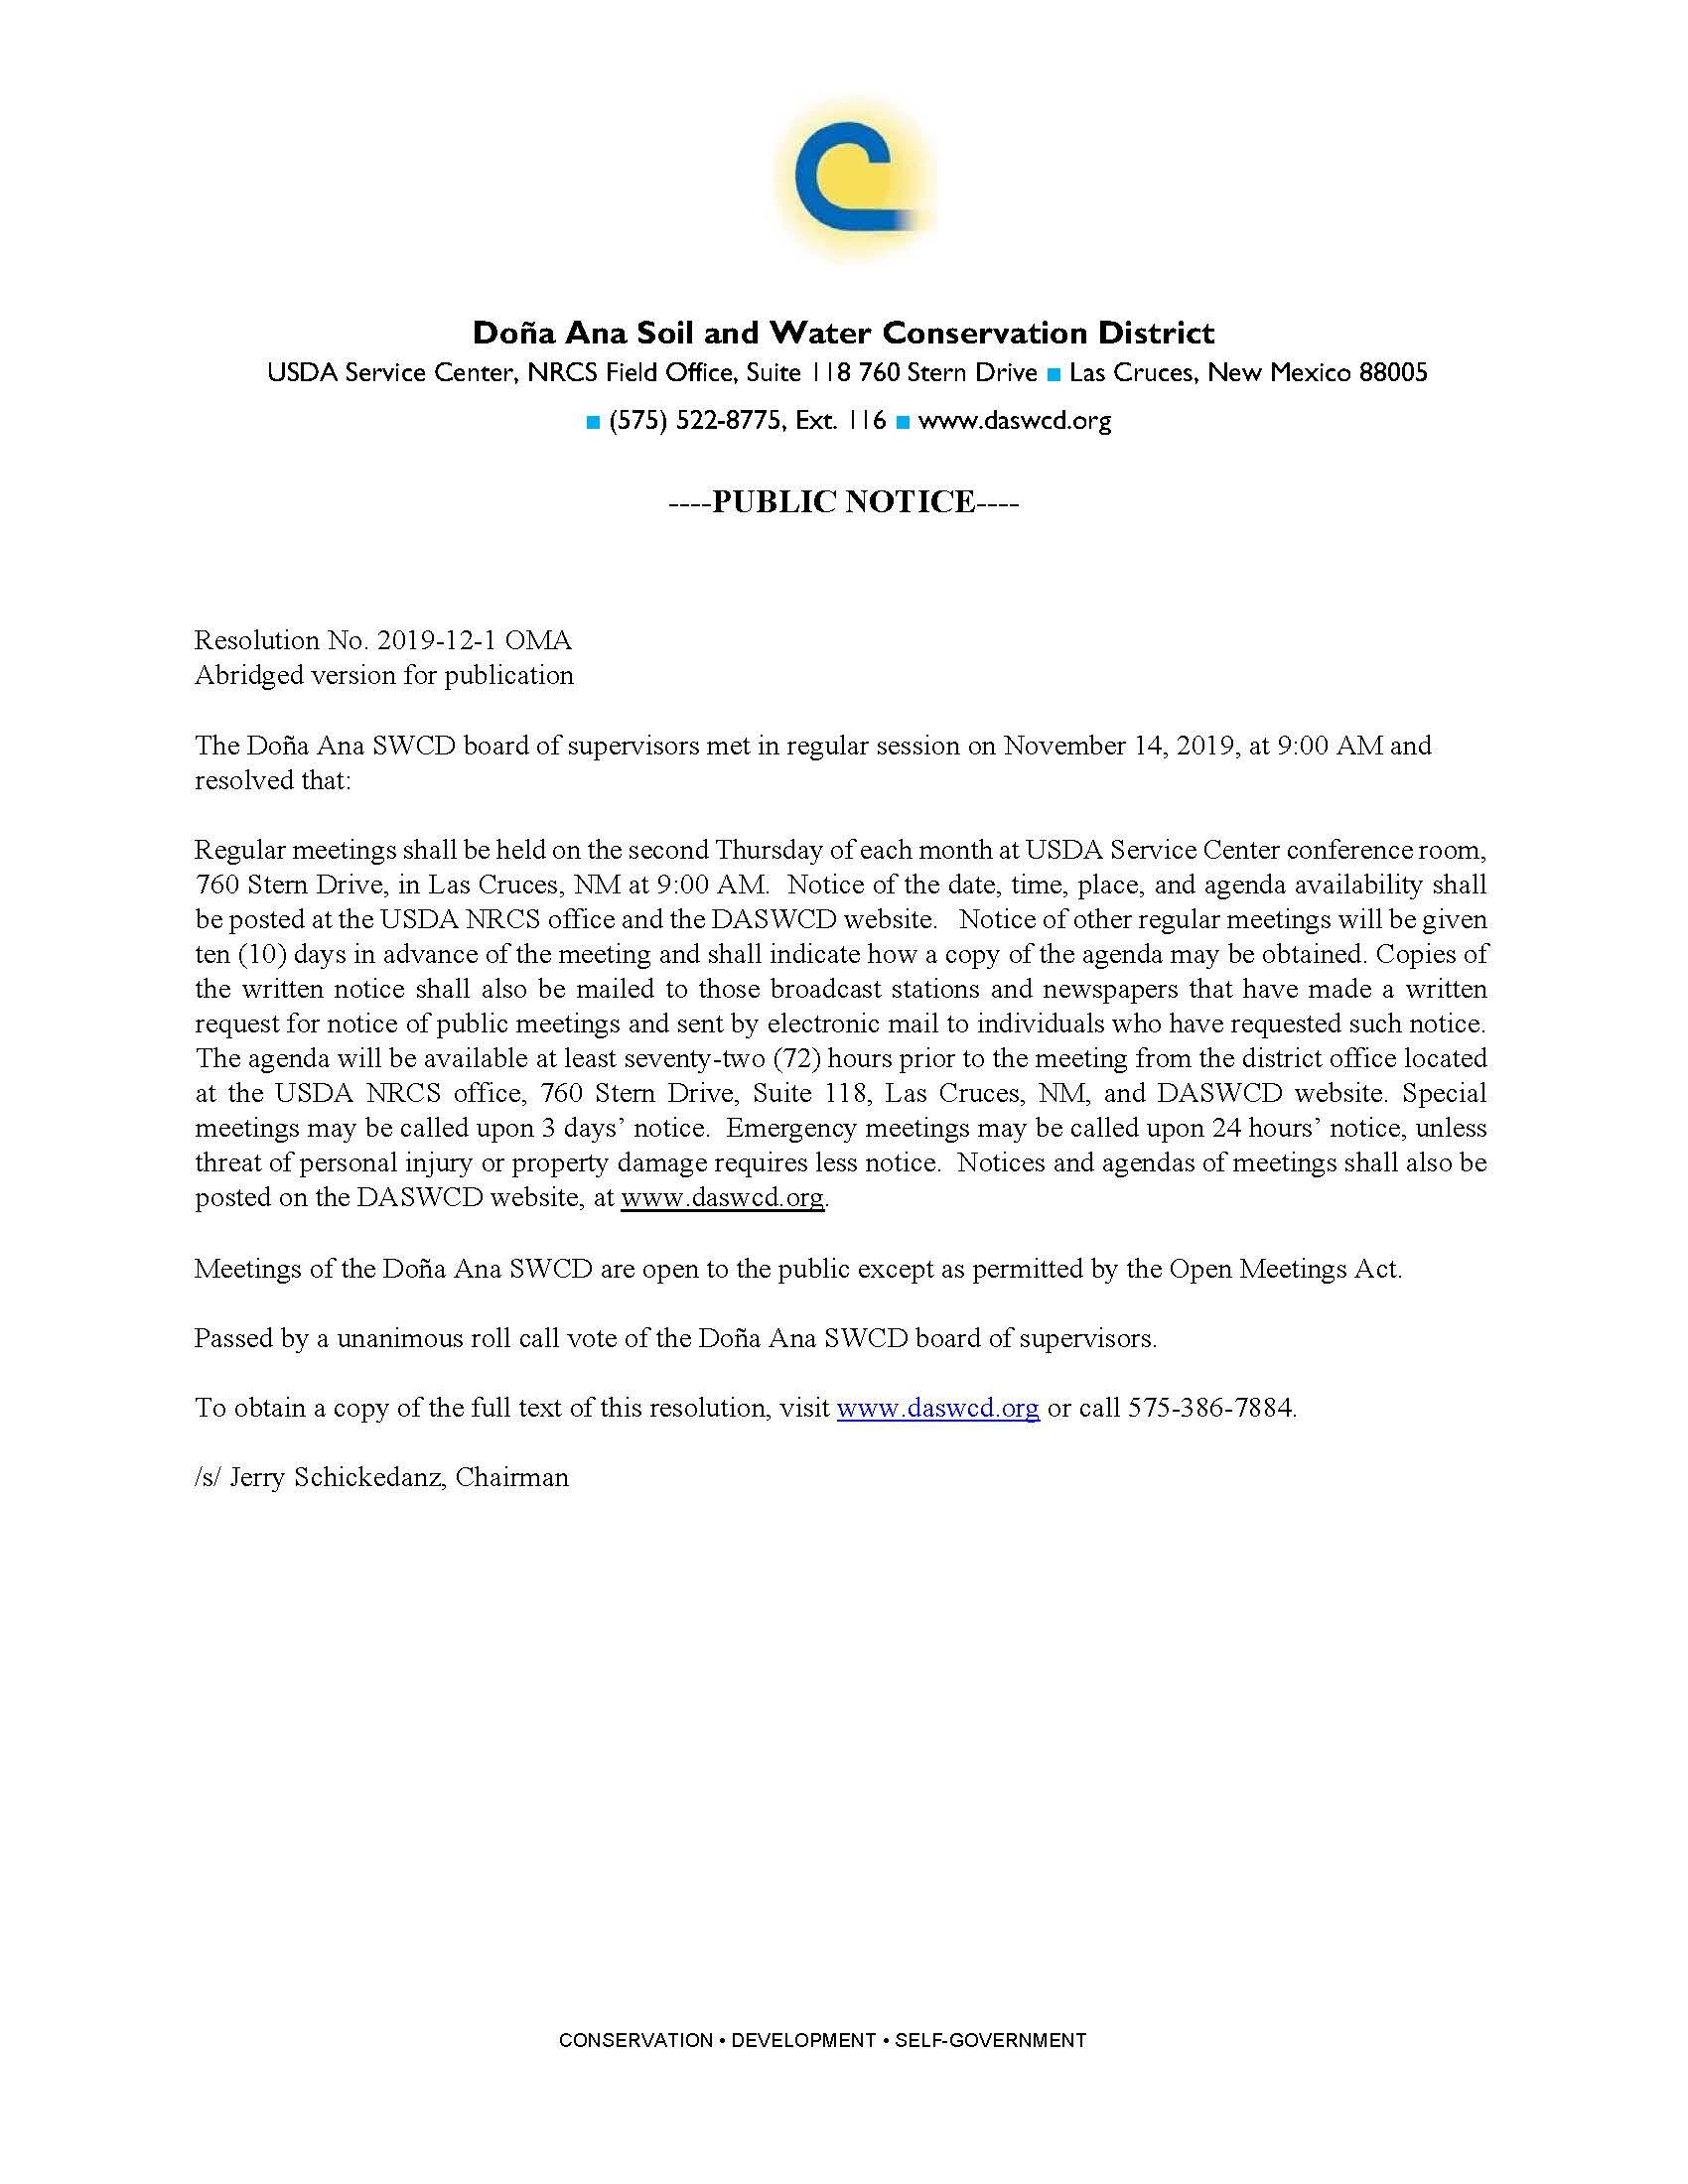 DASWCD Public Notice Open Meetings Act 2020